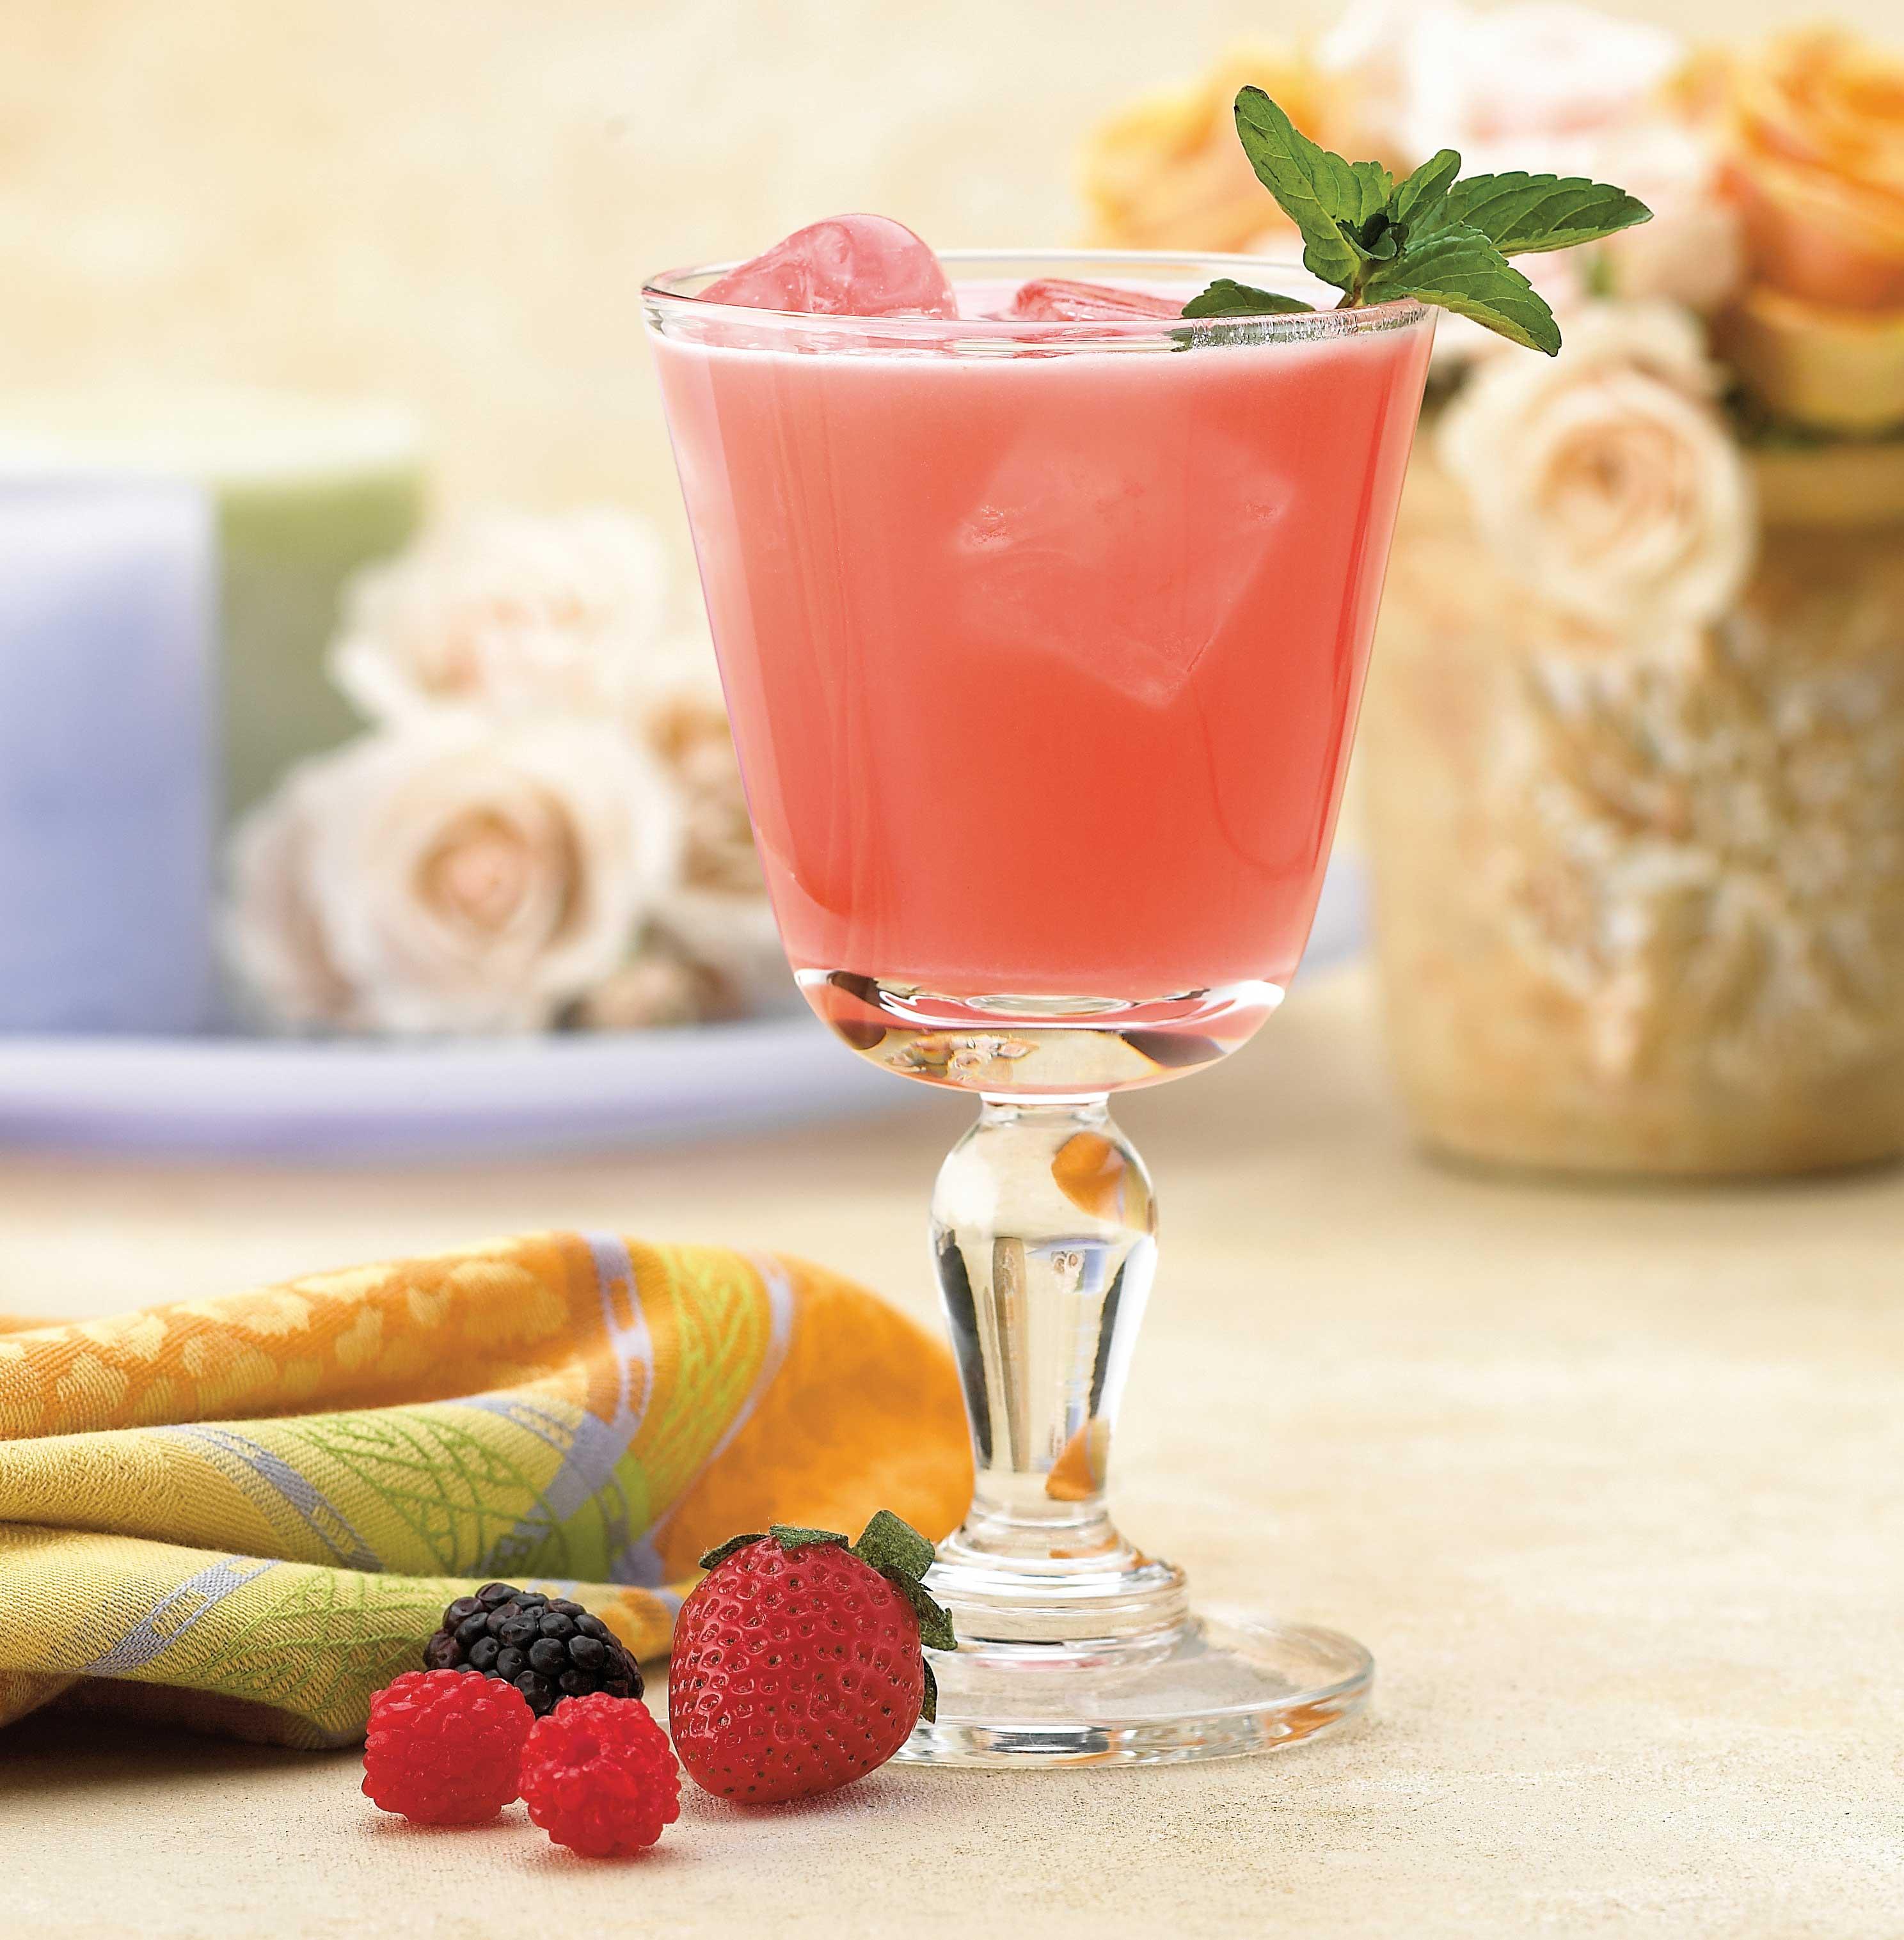 Wildberry Fruit Drink